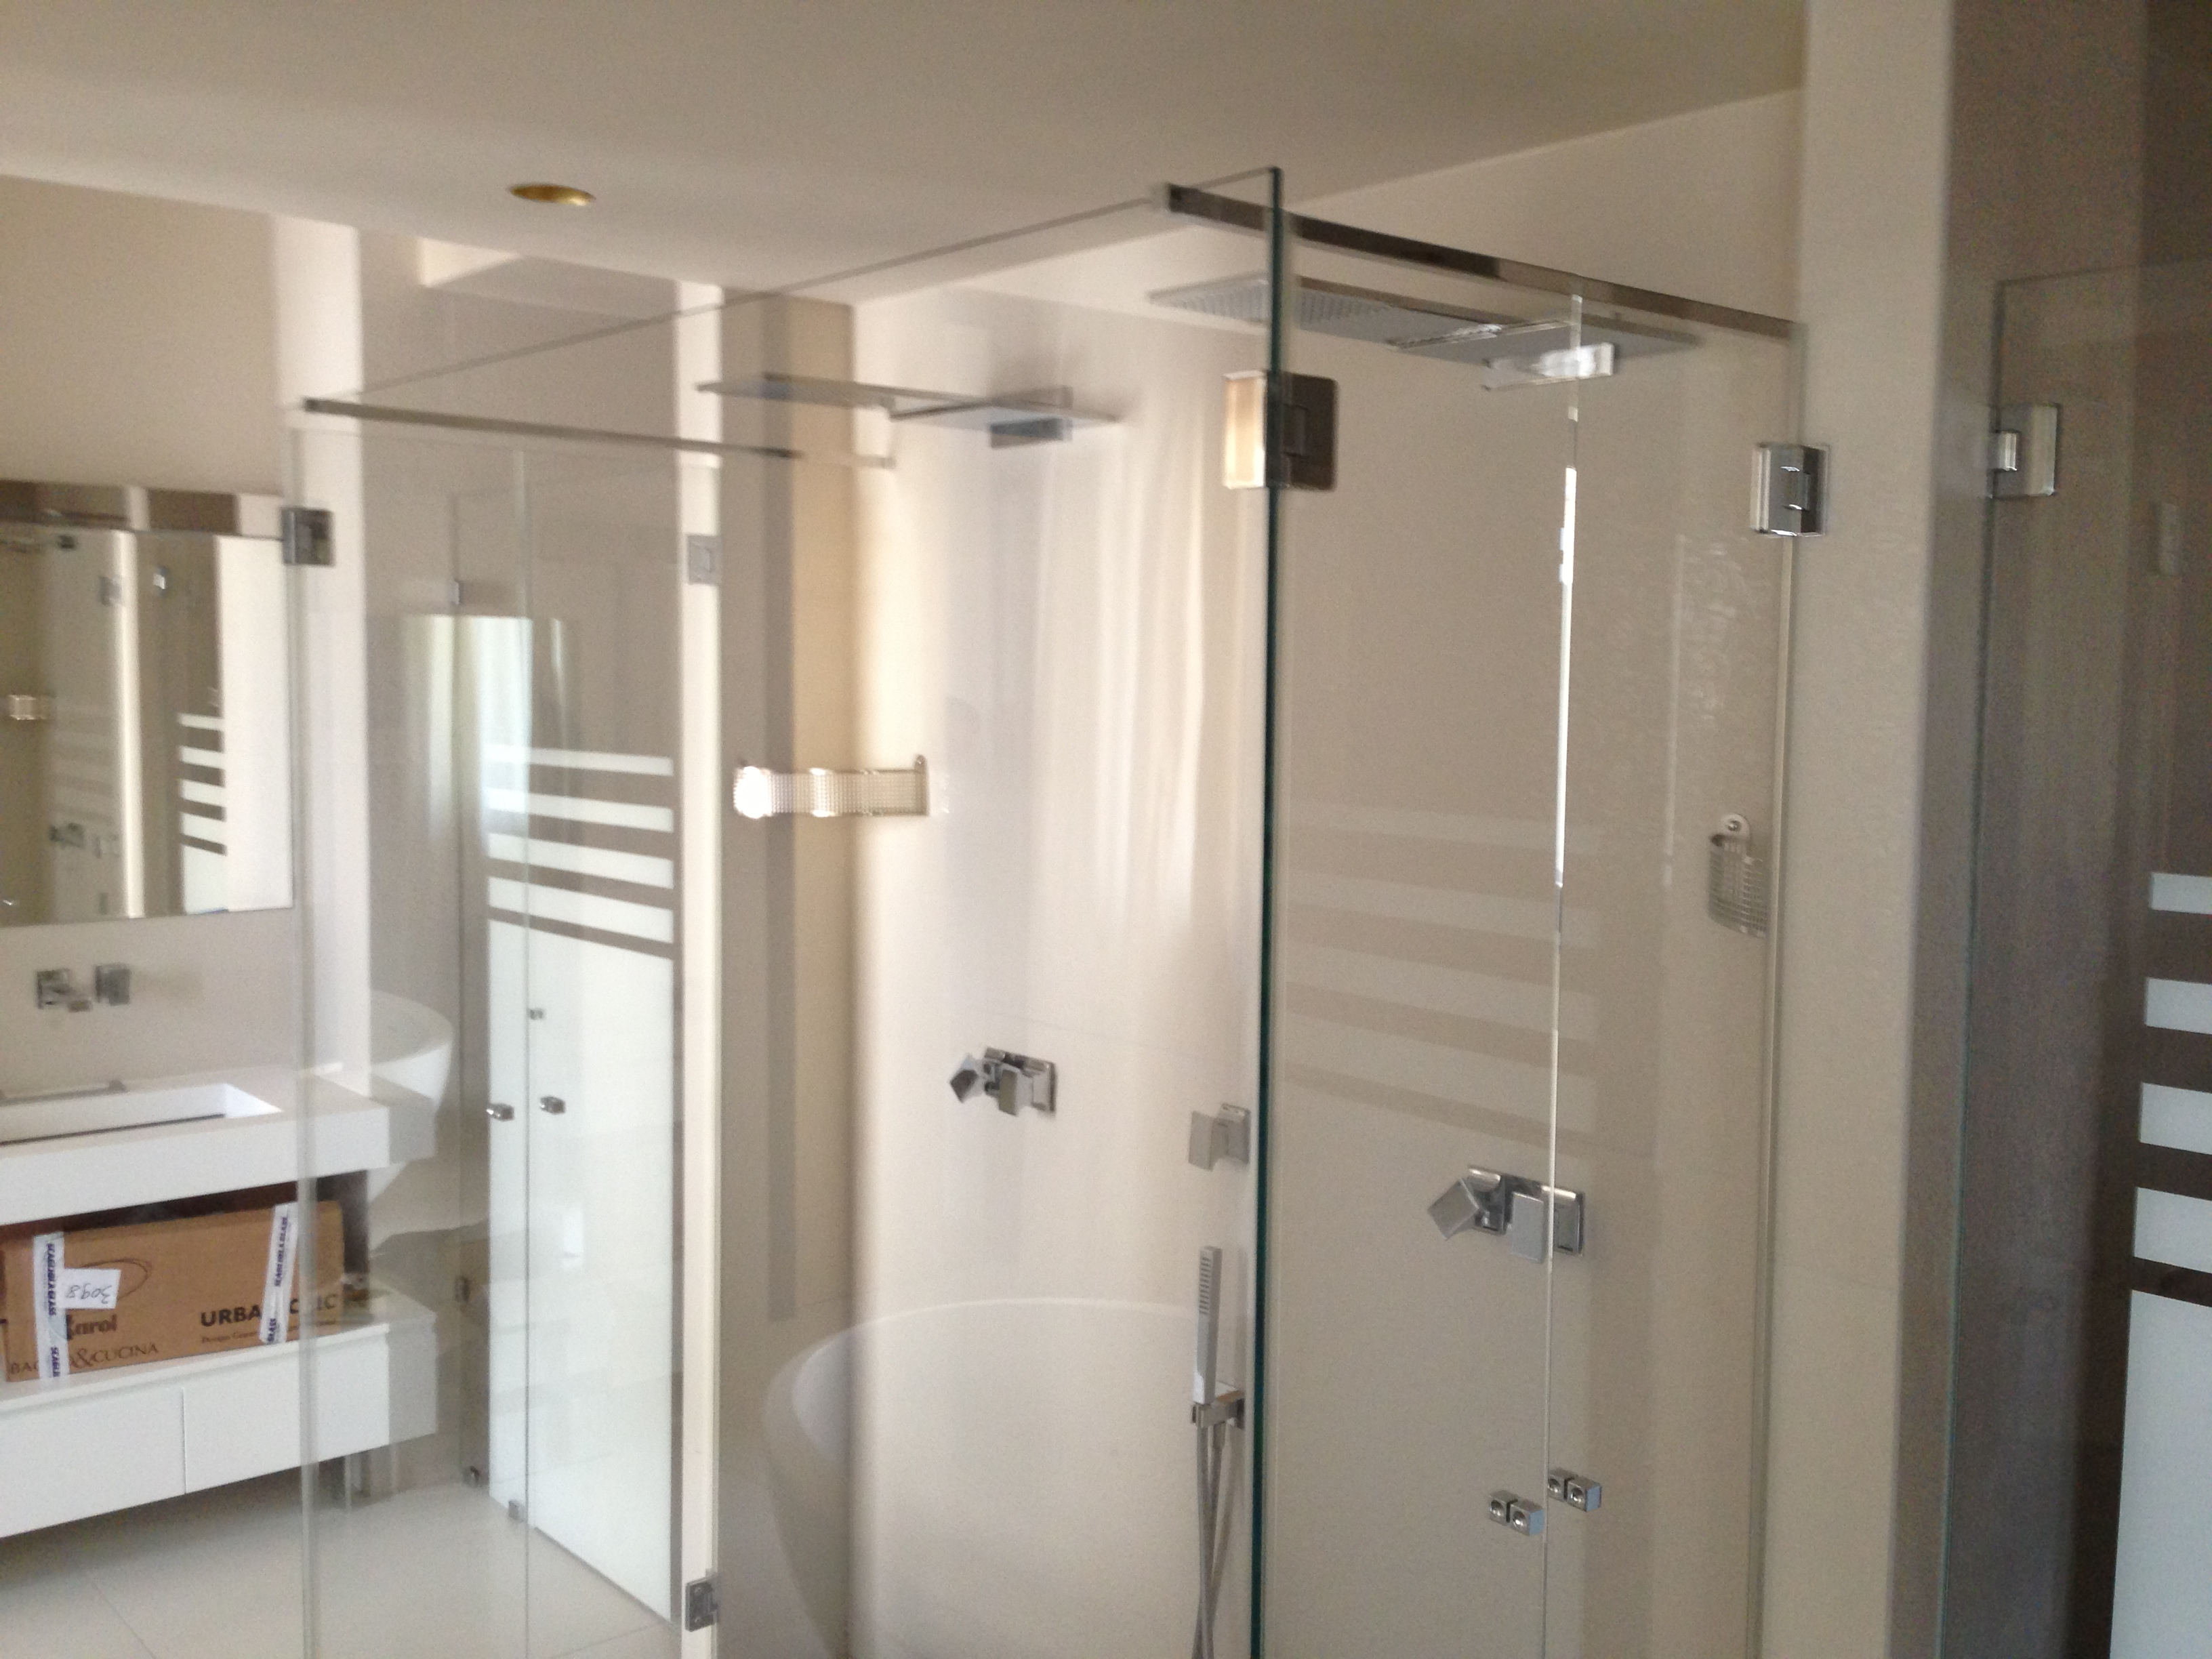 Scagliola glass vetreria torino box doccia doppia entrata